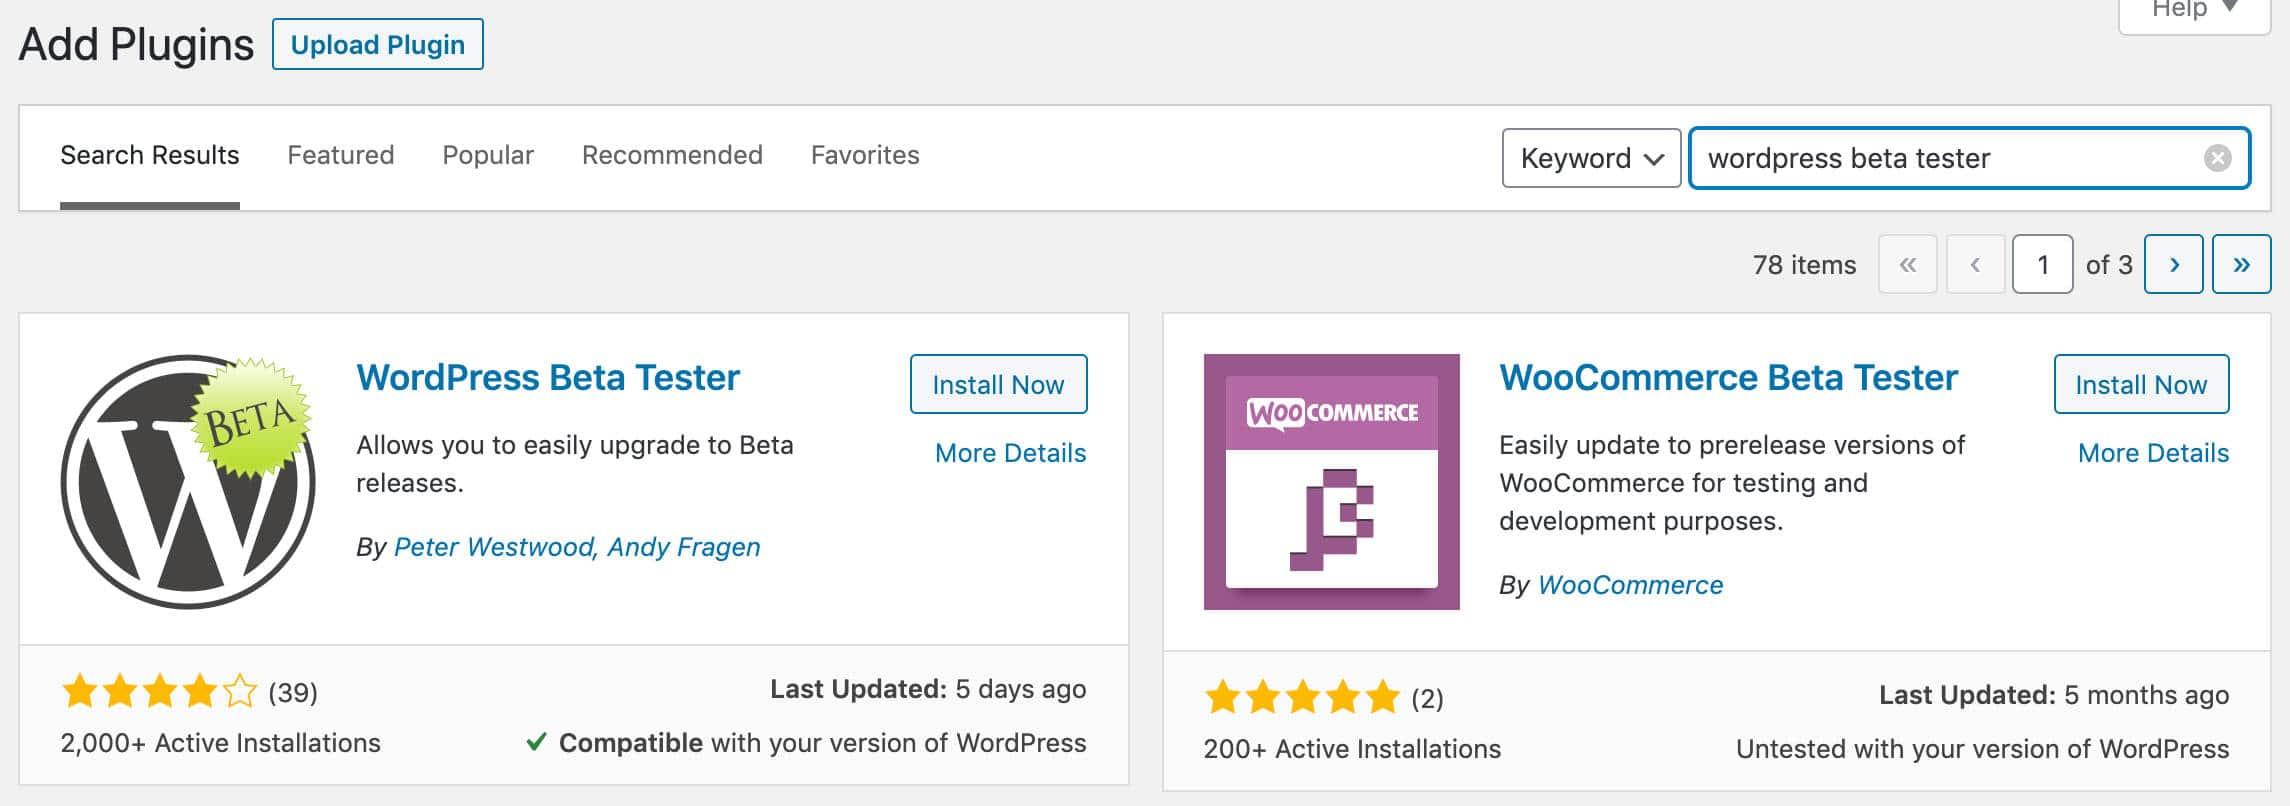 Instalar el plugin de WordPress Beta Tester